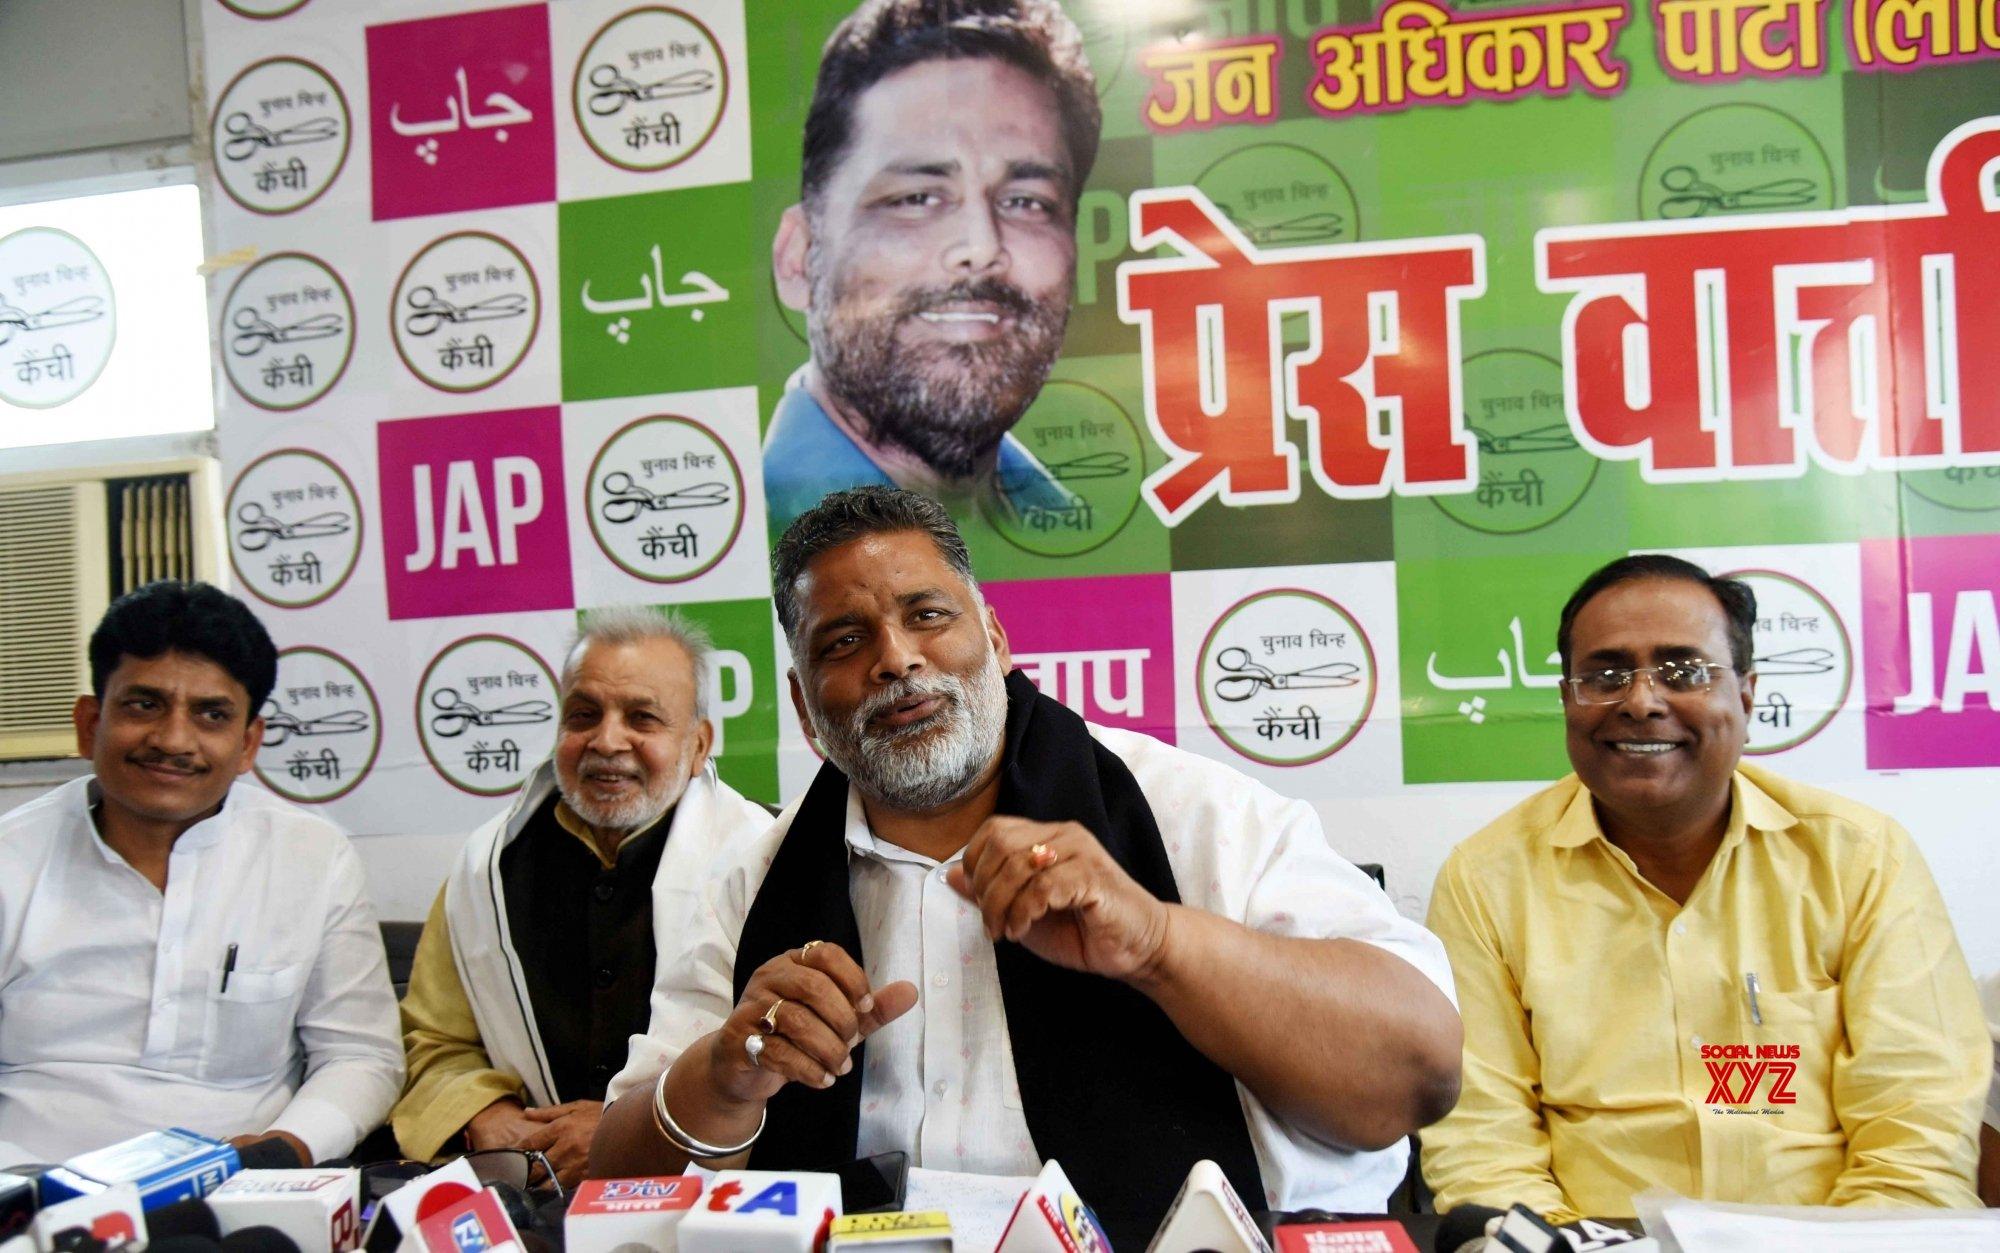 Bihar: Jan Adhikar Party president Rajesh Ranjan alias Pappu Yadav addressing a press conference over the Muzaffarpur liquor incident in Patna on Tuesday 23rd February, 2021 #Gallery